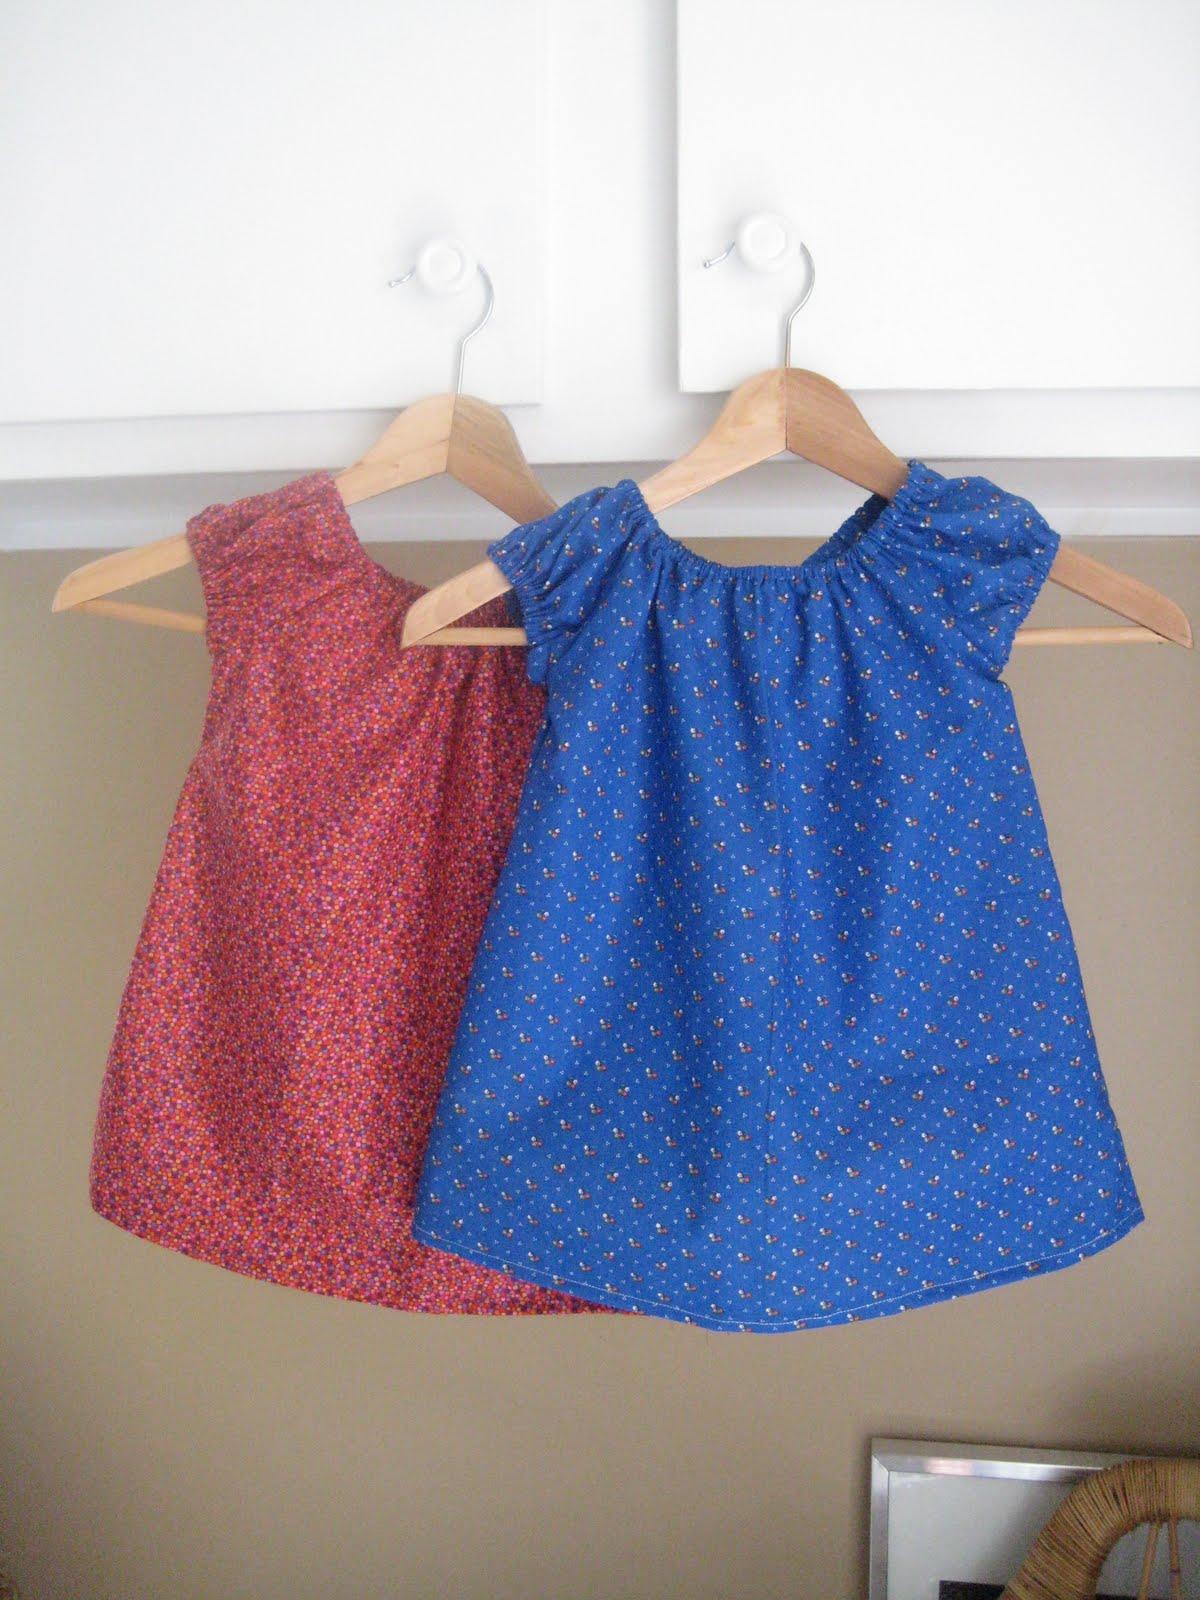 http://2.bp.blogspot.com/_MKK0mUiM8II/S_GRwOzCusI/AAAAAAAAAzE/nqIetqglRuI/s1600/Dresses1.JPG